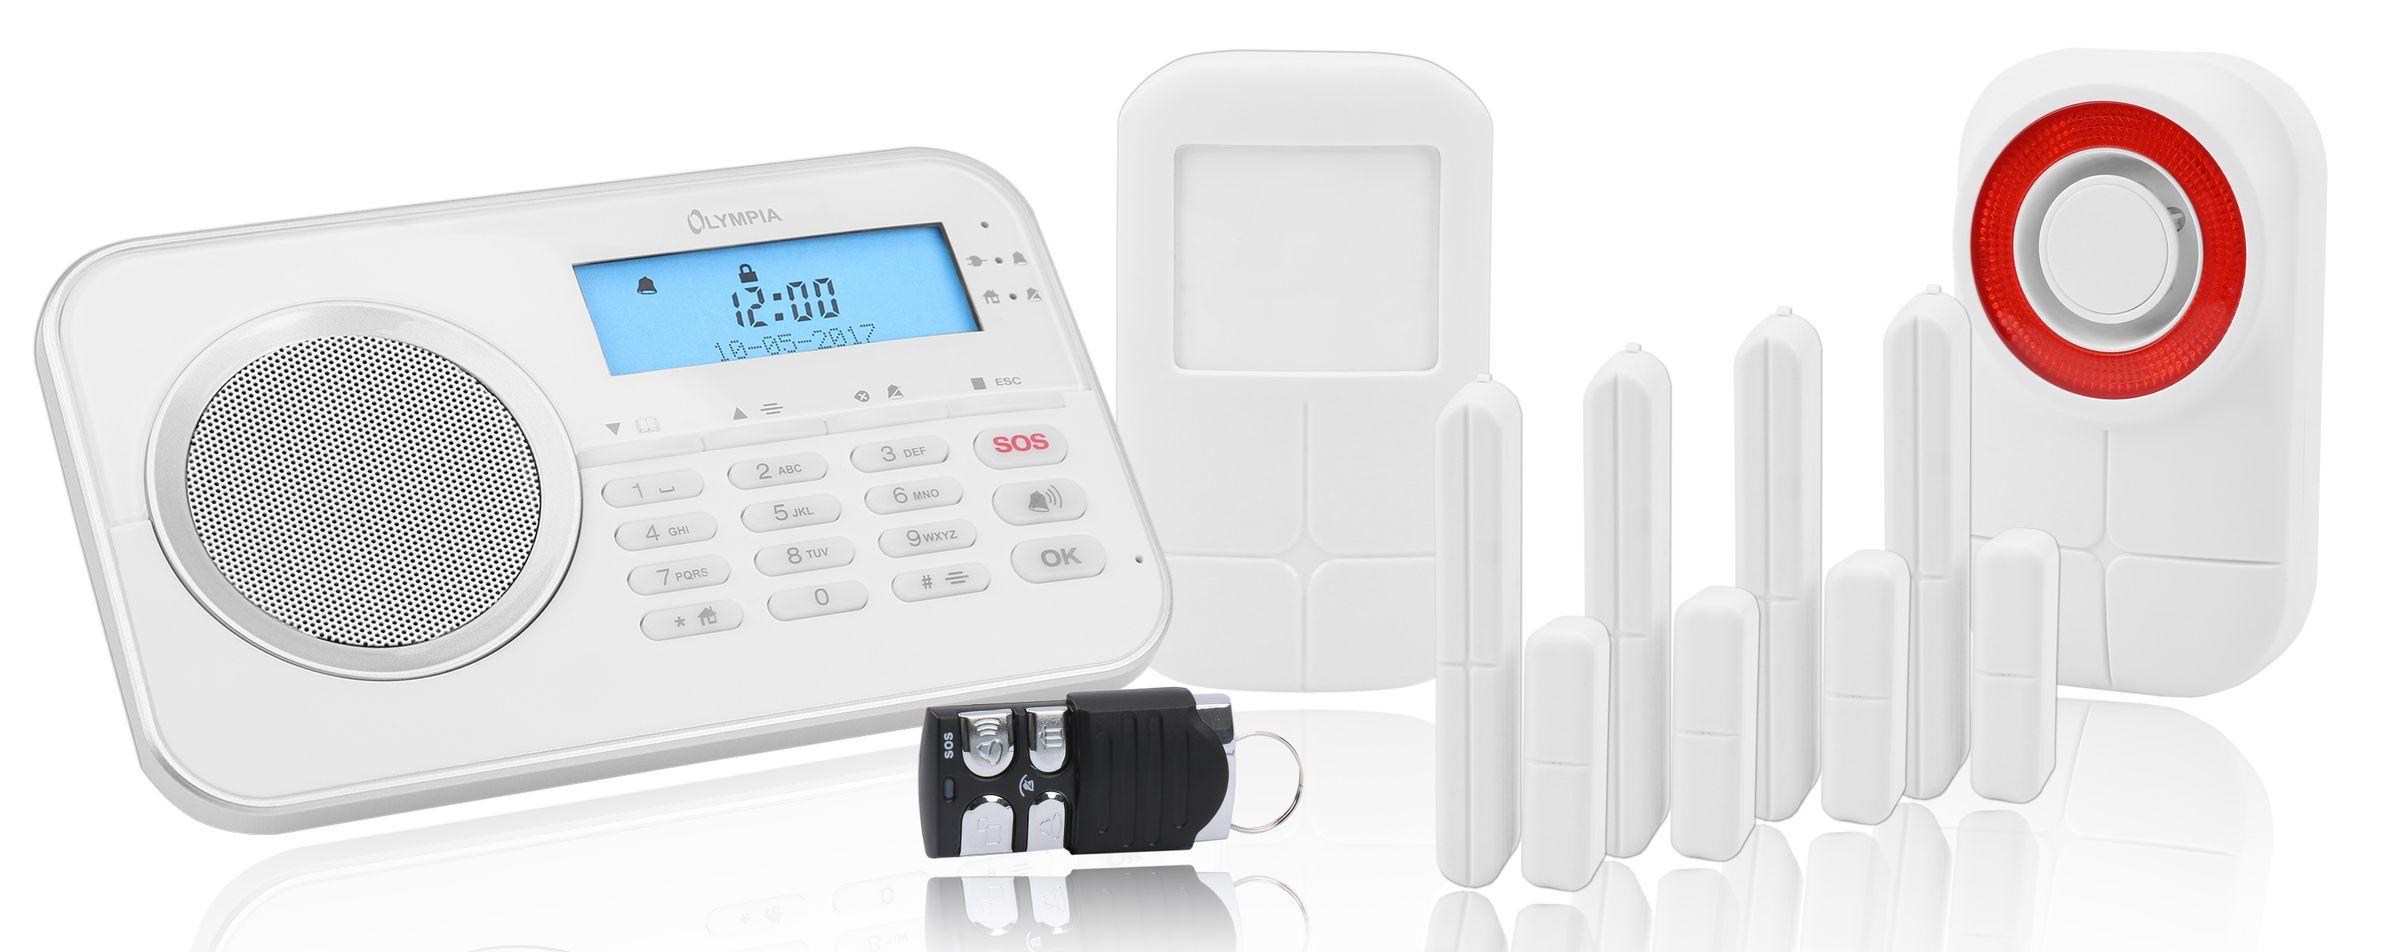 Olympia Protect 9761 GSM Haus Alarmanlage Funk Alarmanlagen Set mit App